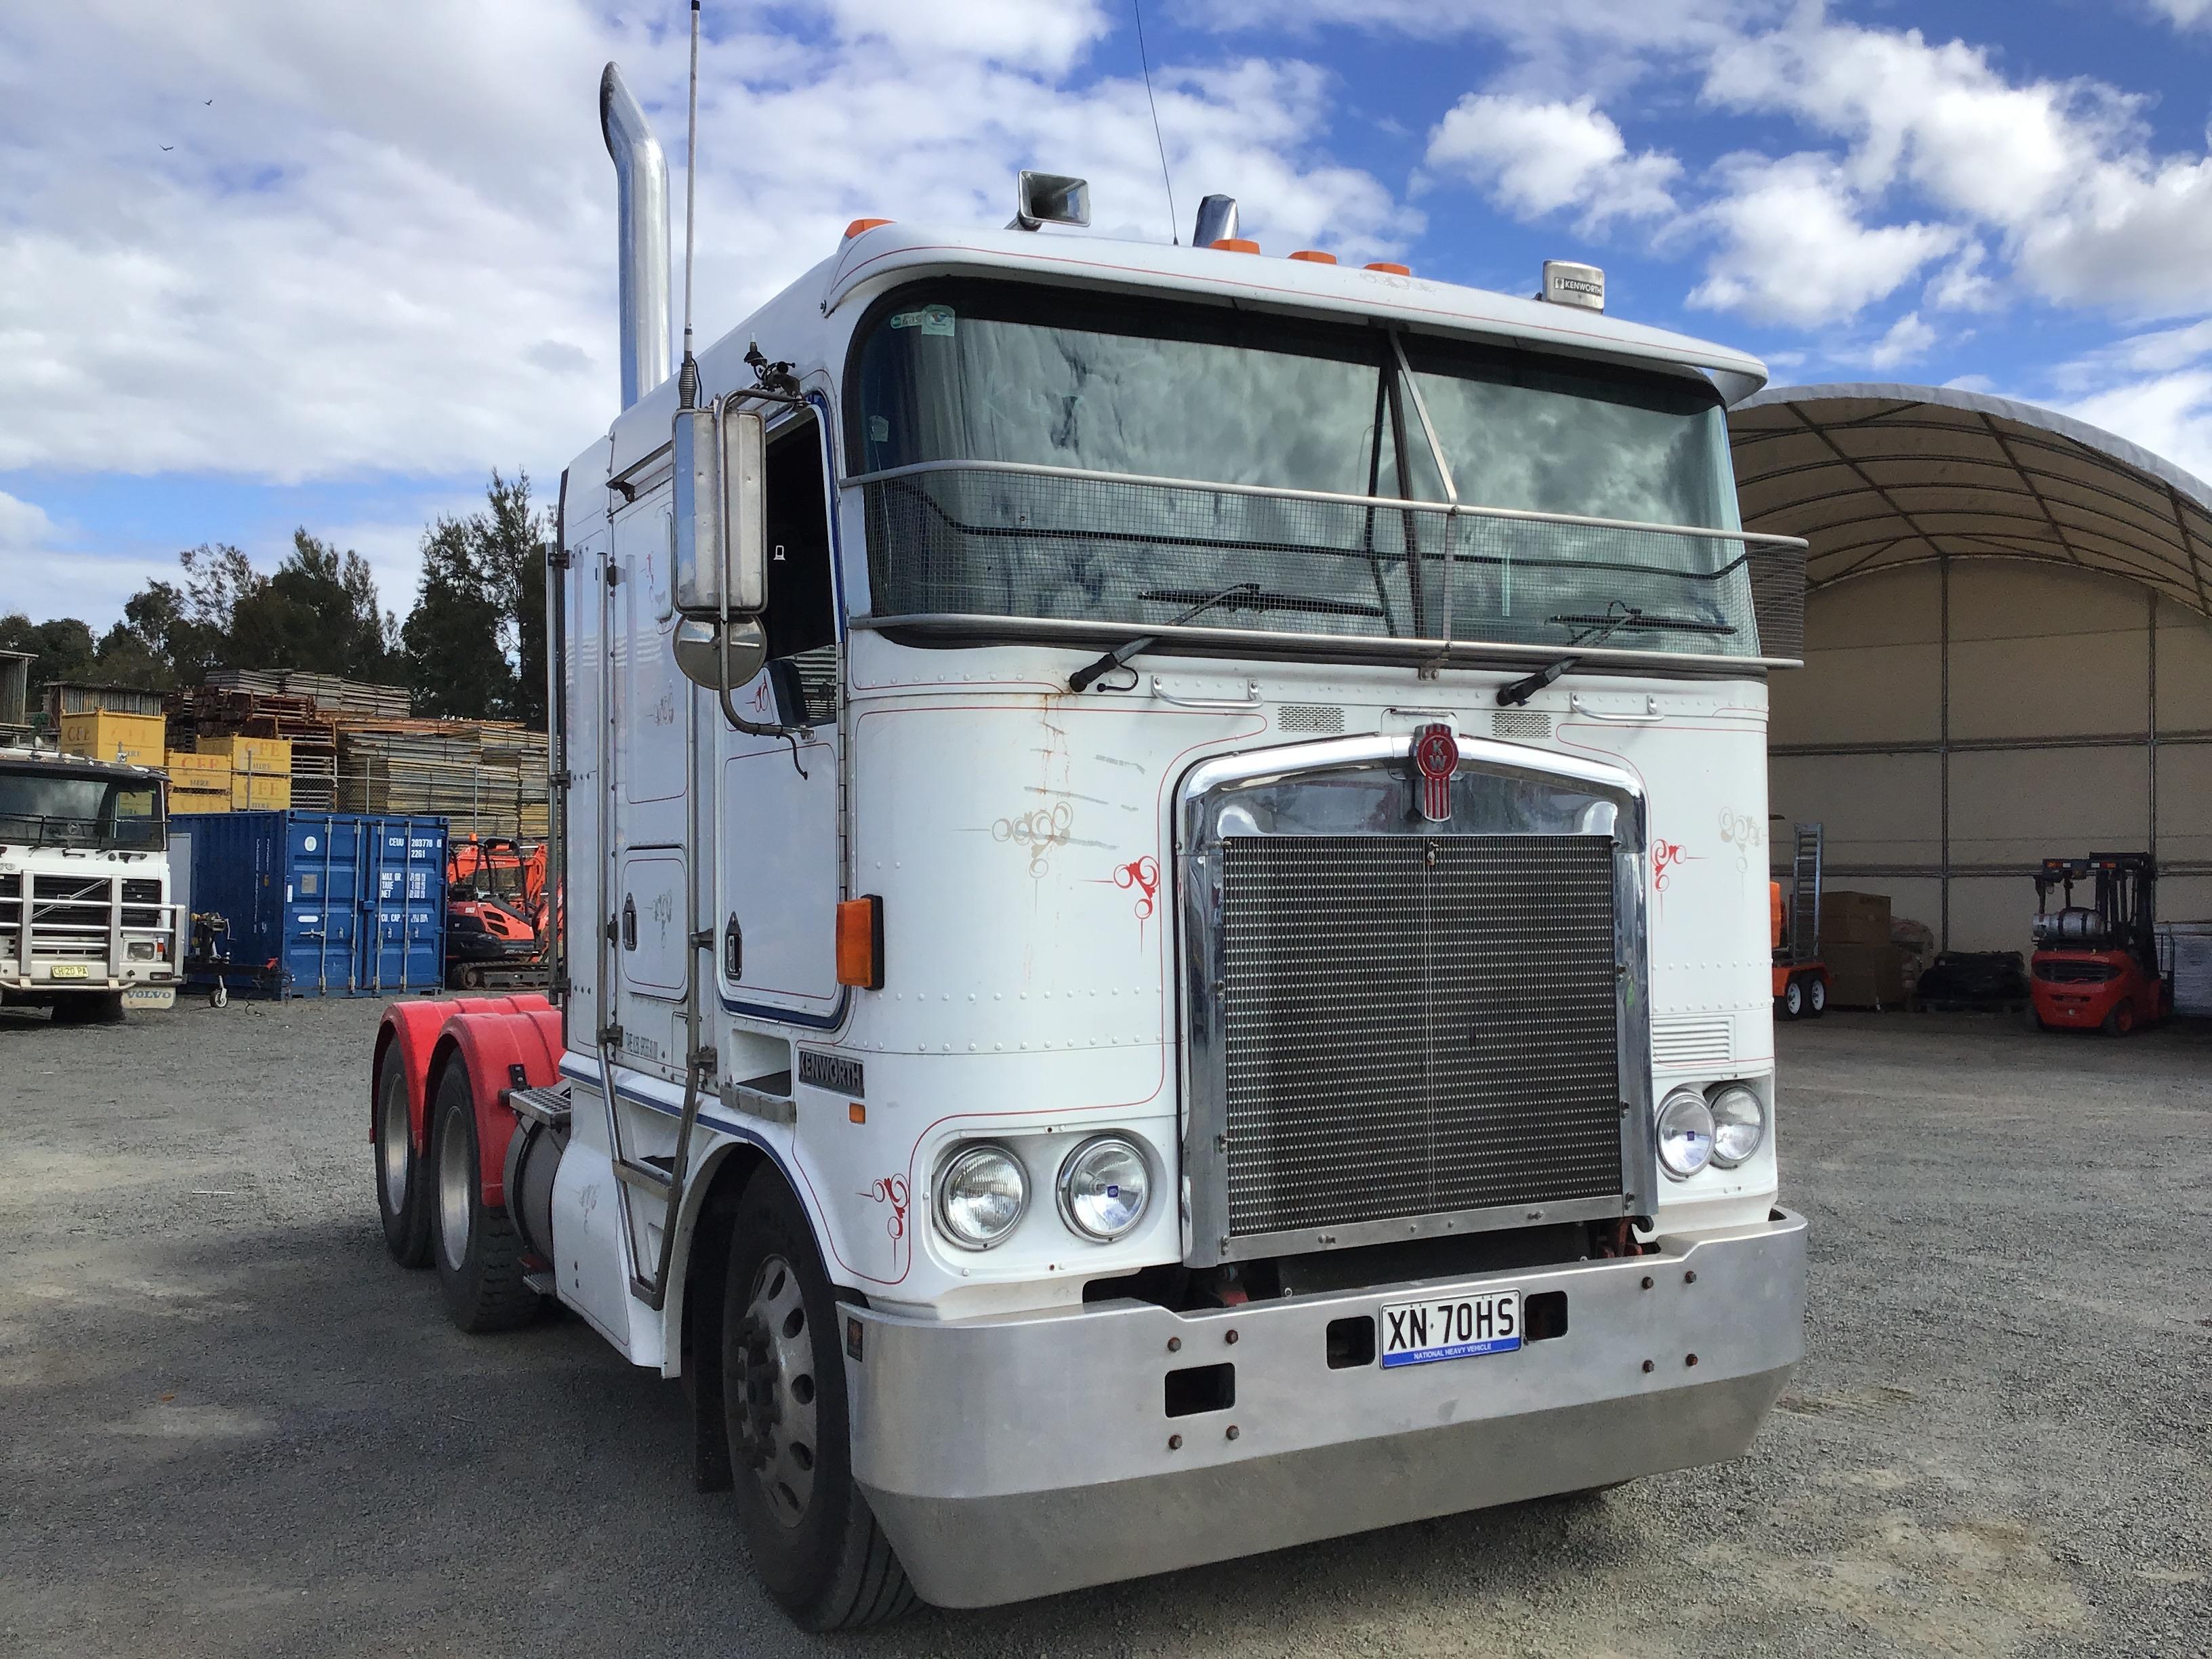 2002 Kenworth K104 6 x 4 Prime Mover Truck